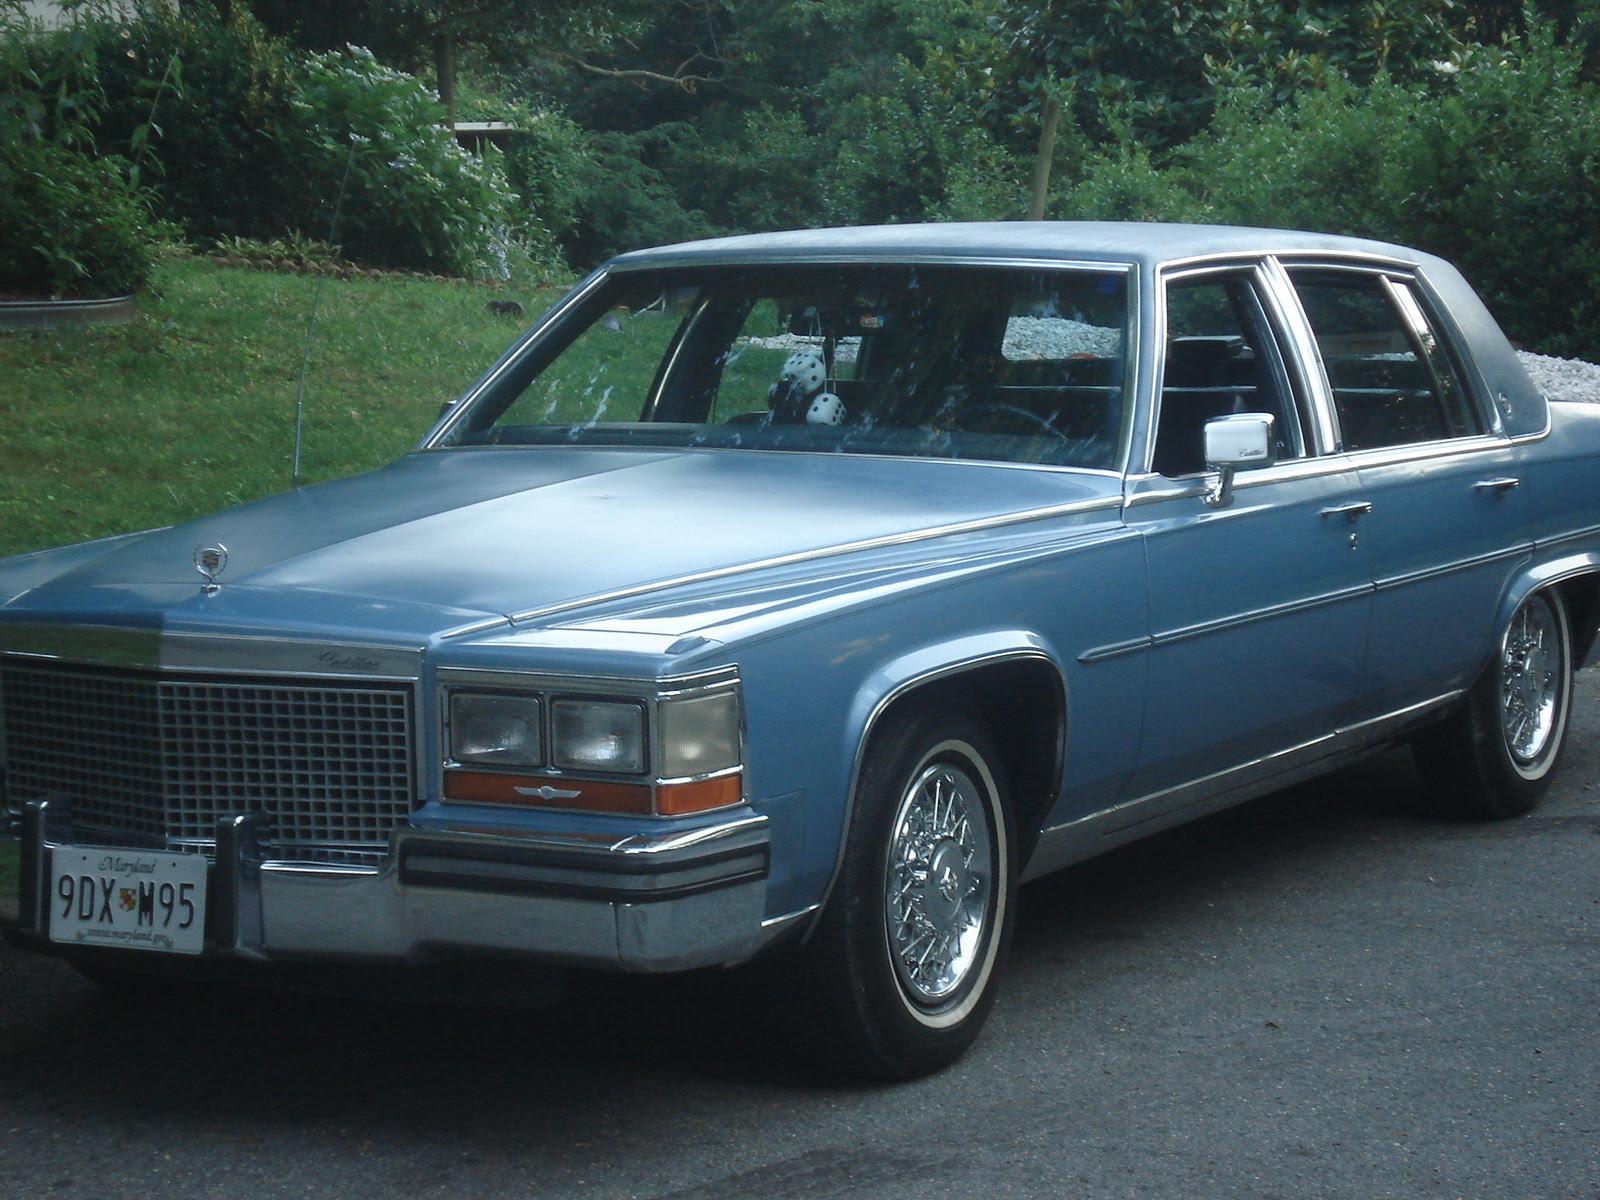 1988 Cadillac Fleetwood - Pictures - CarGurus